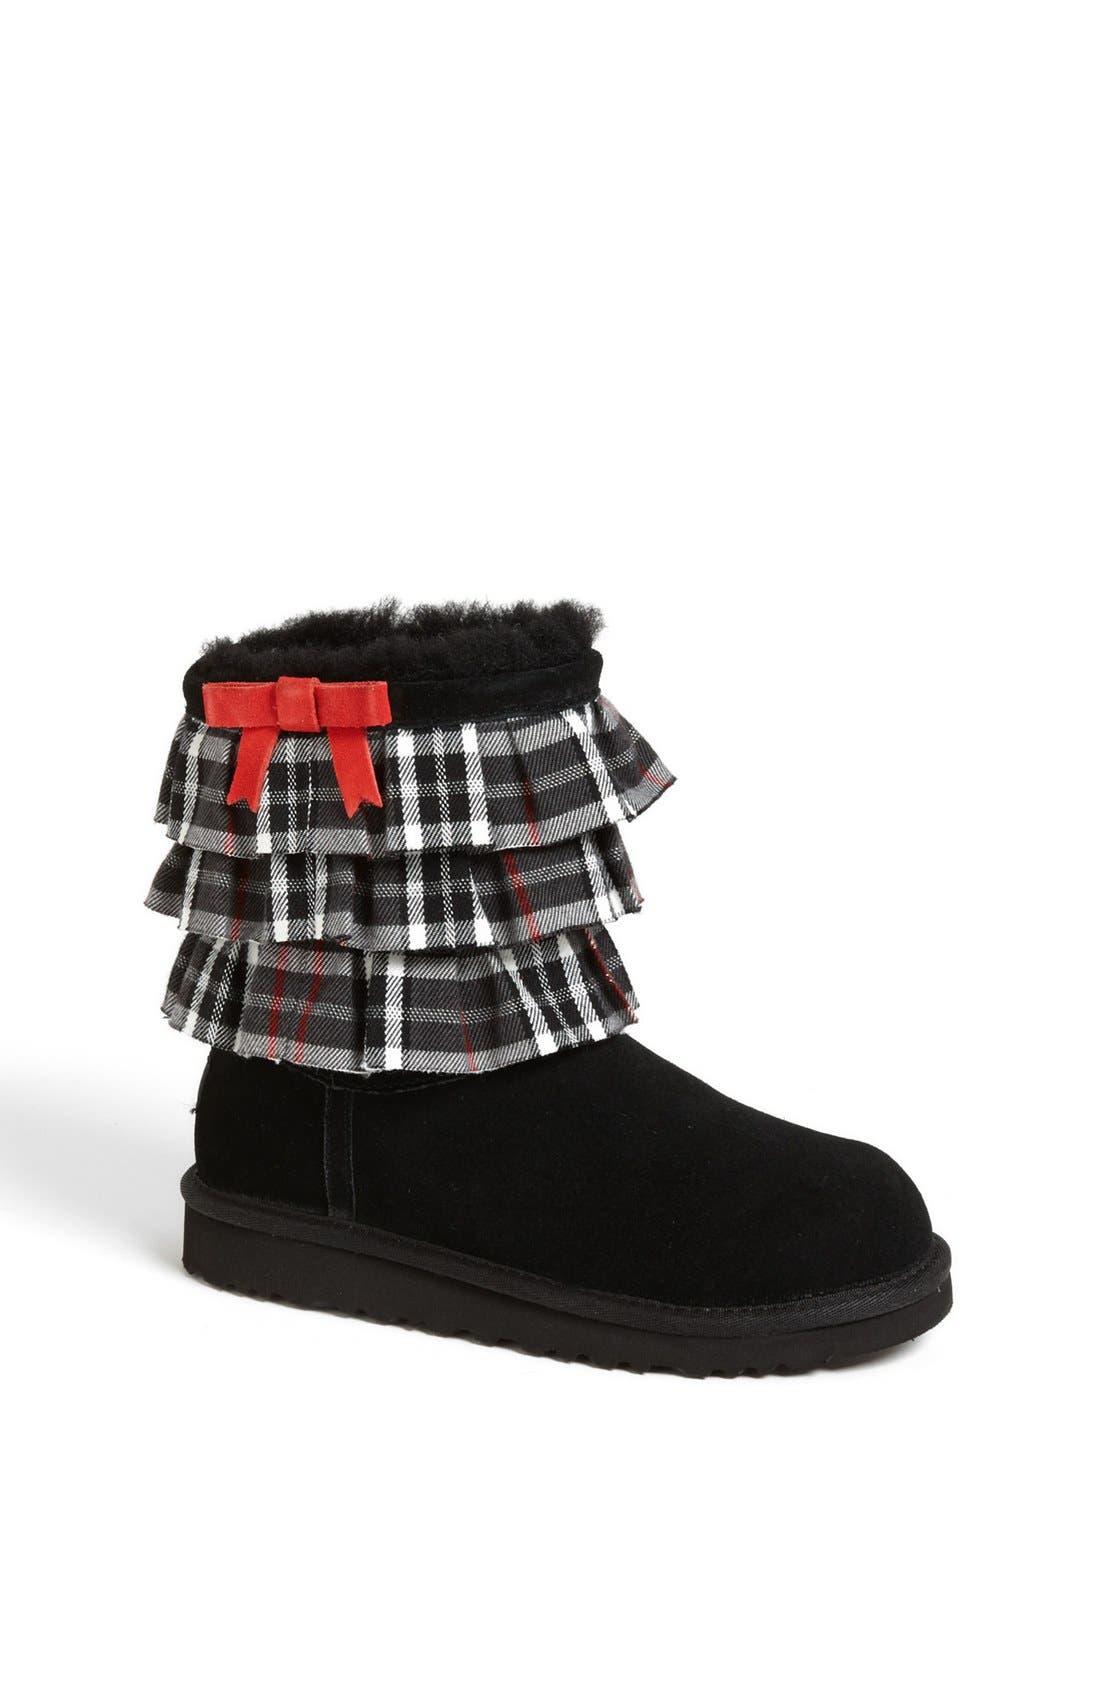 Main Image - UGG® Australia 'Eloise' Boot (Toddler, Little Kid & Big Kid)